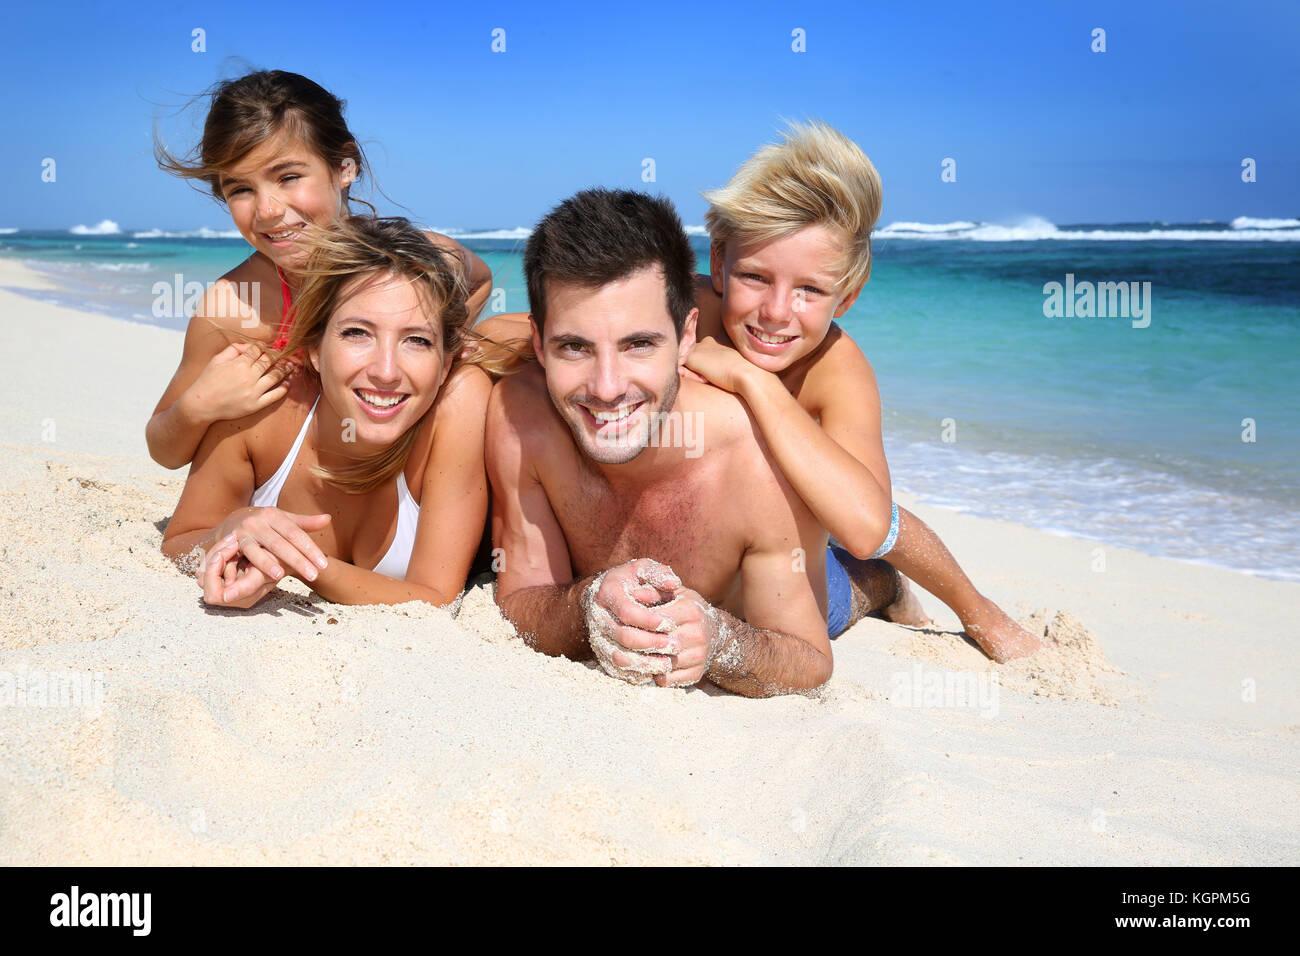 domashnee-video-semeynih-nudistov